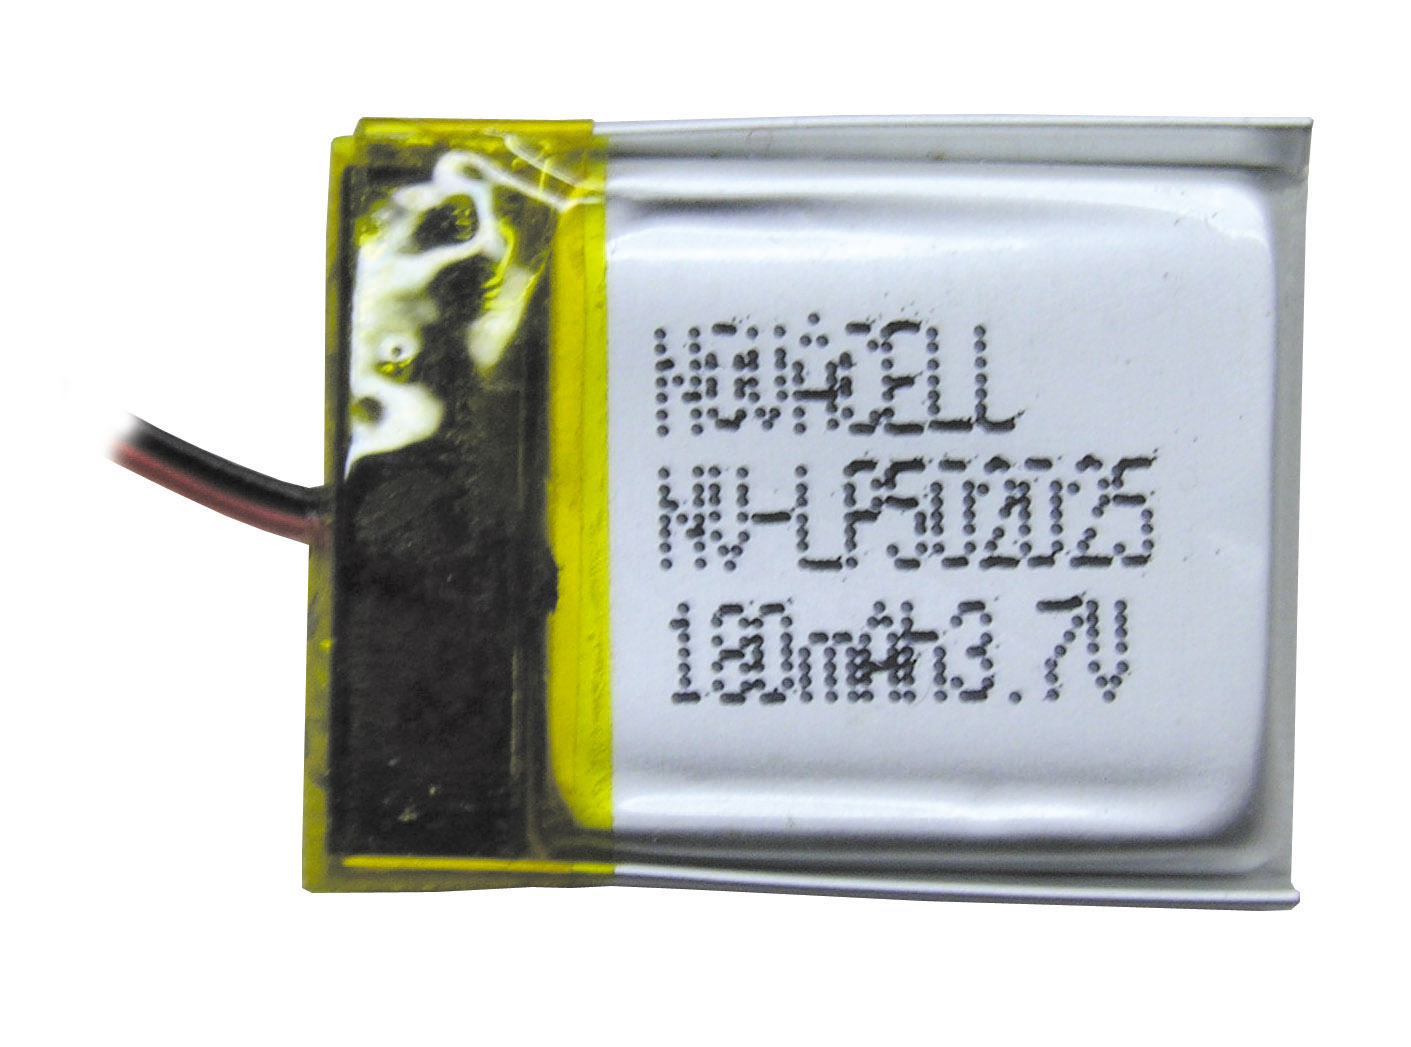 Lithium-Polymer Akku, 180 mAh, 10C Entladestrom, 6.5 x 22 x 27 mm